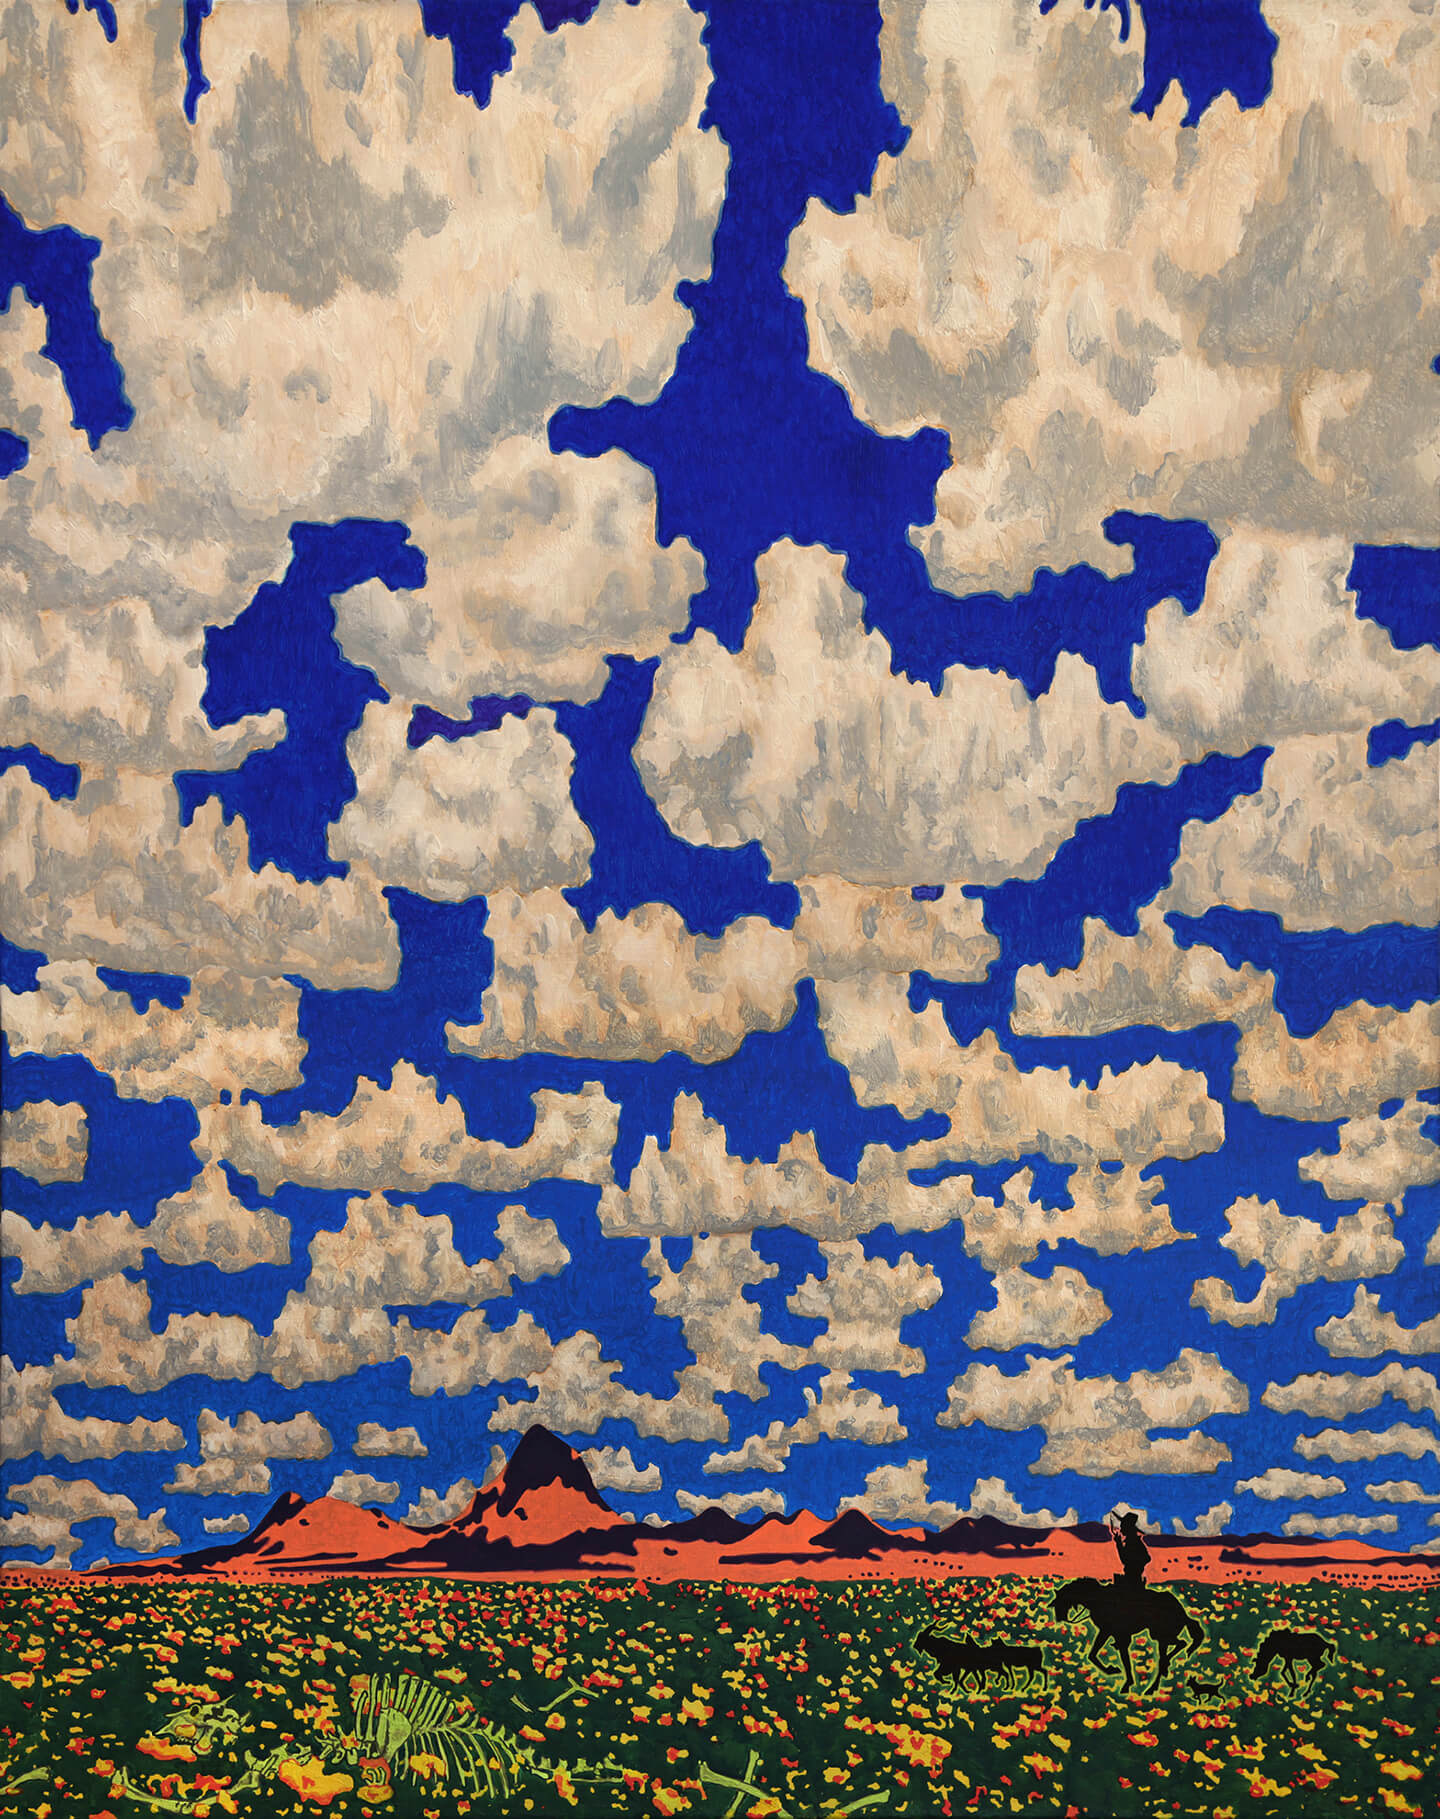 Cloud World (Shepherd with Wildflowers)